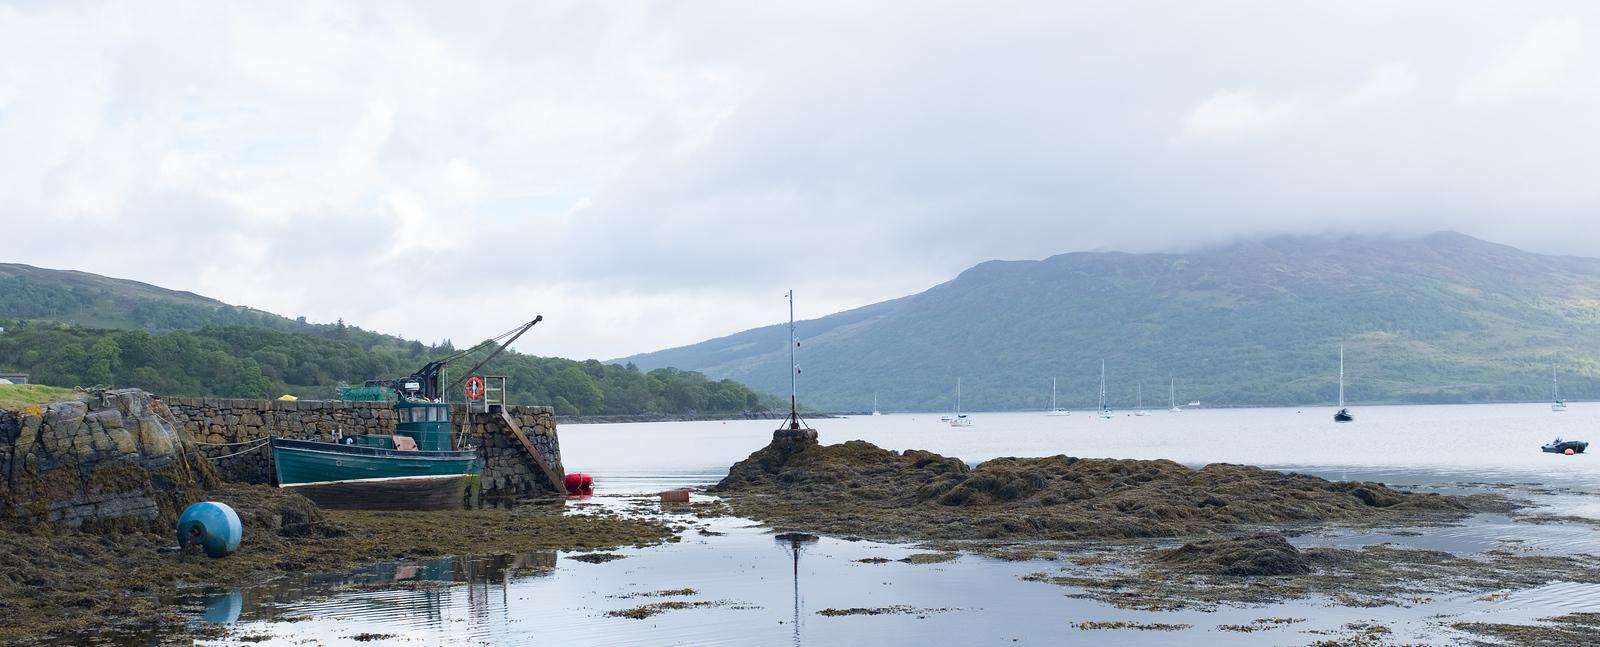 Boat Harbour Isleornsay,  Isle of Skye May 2017